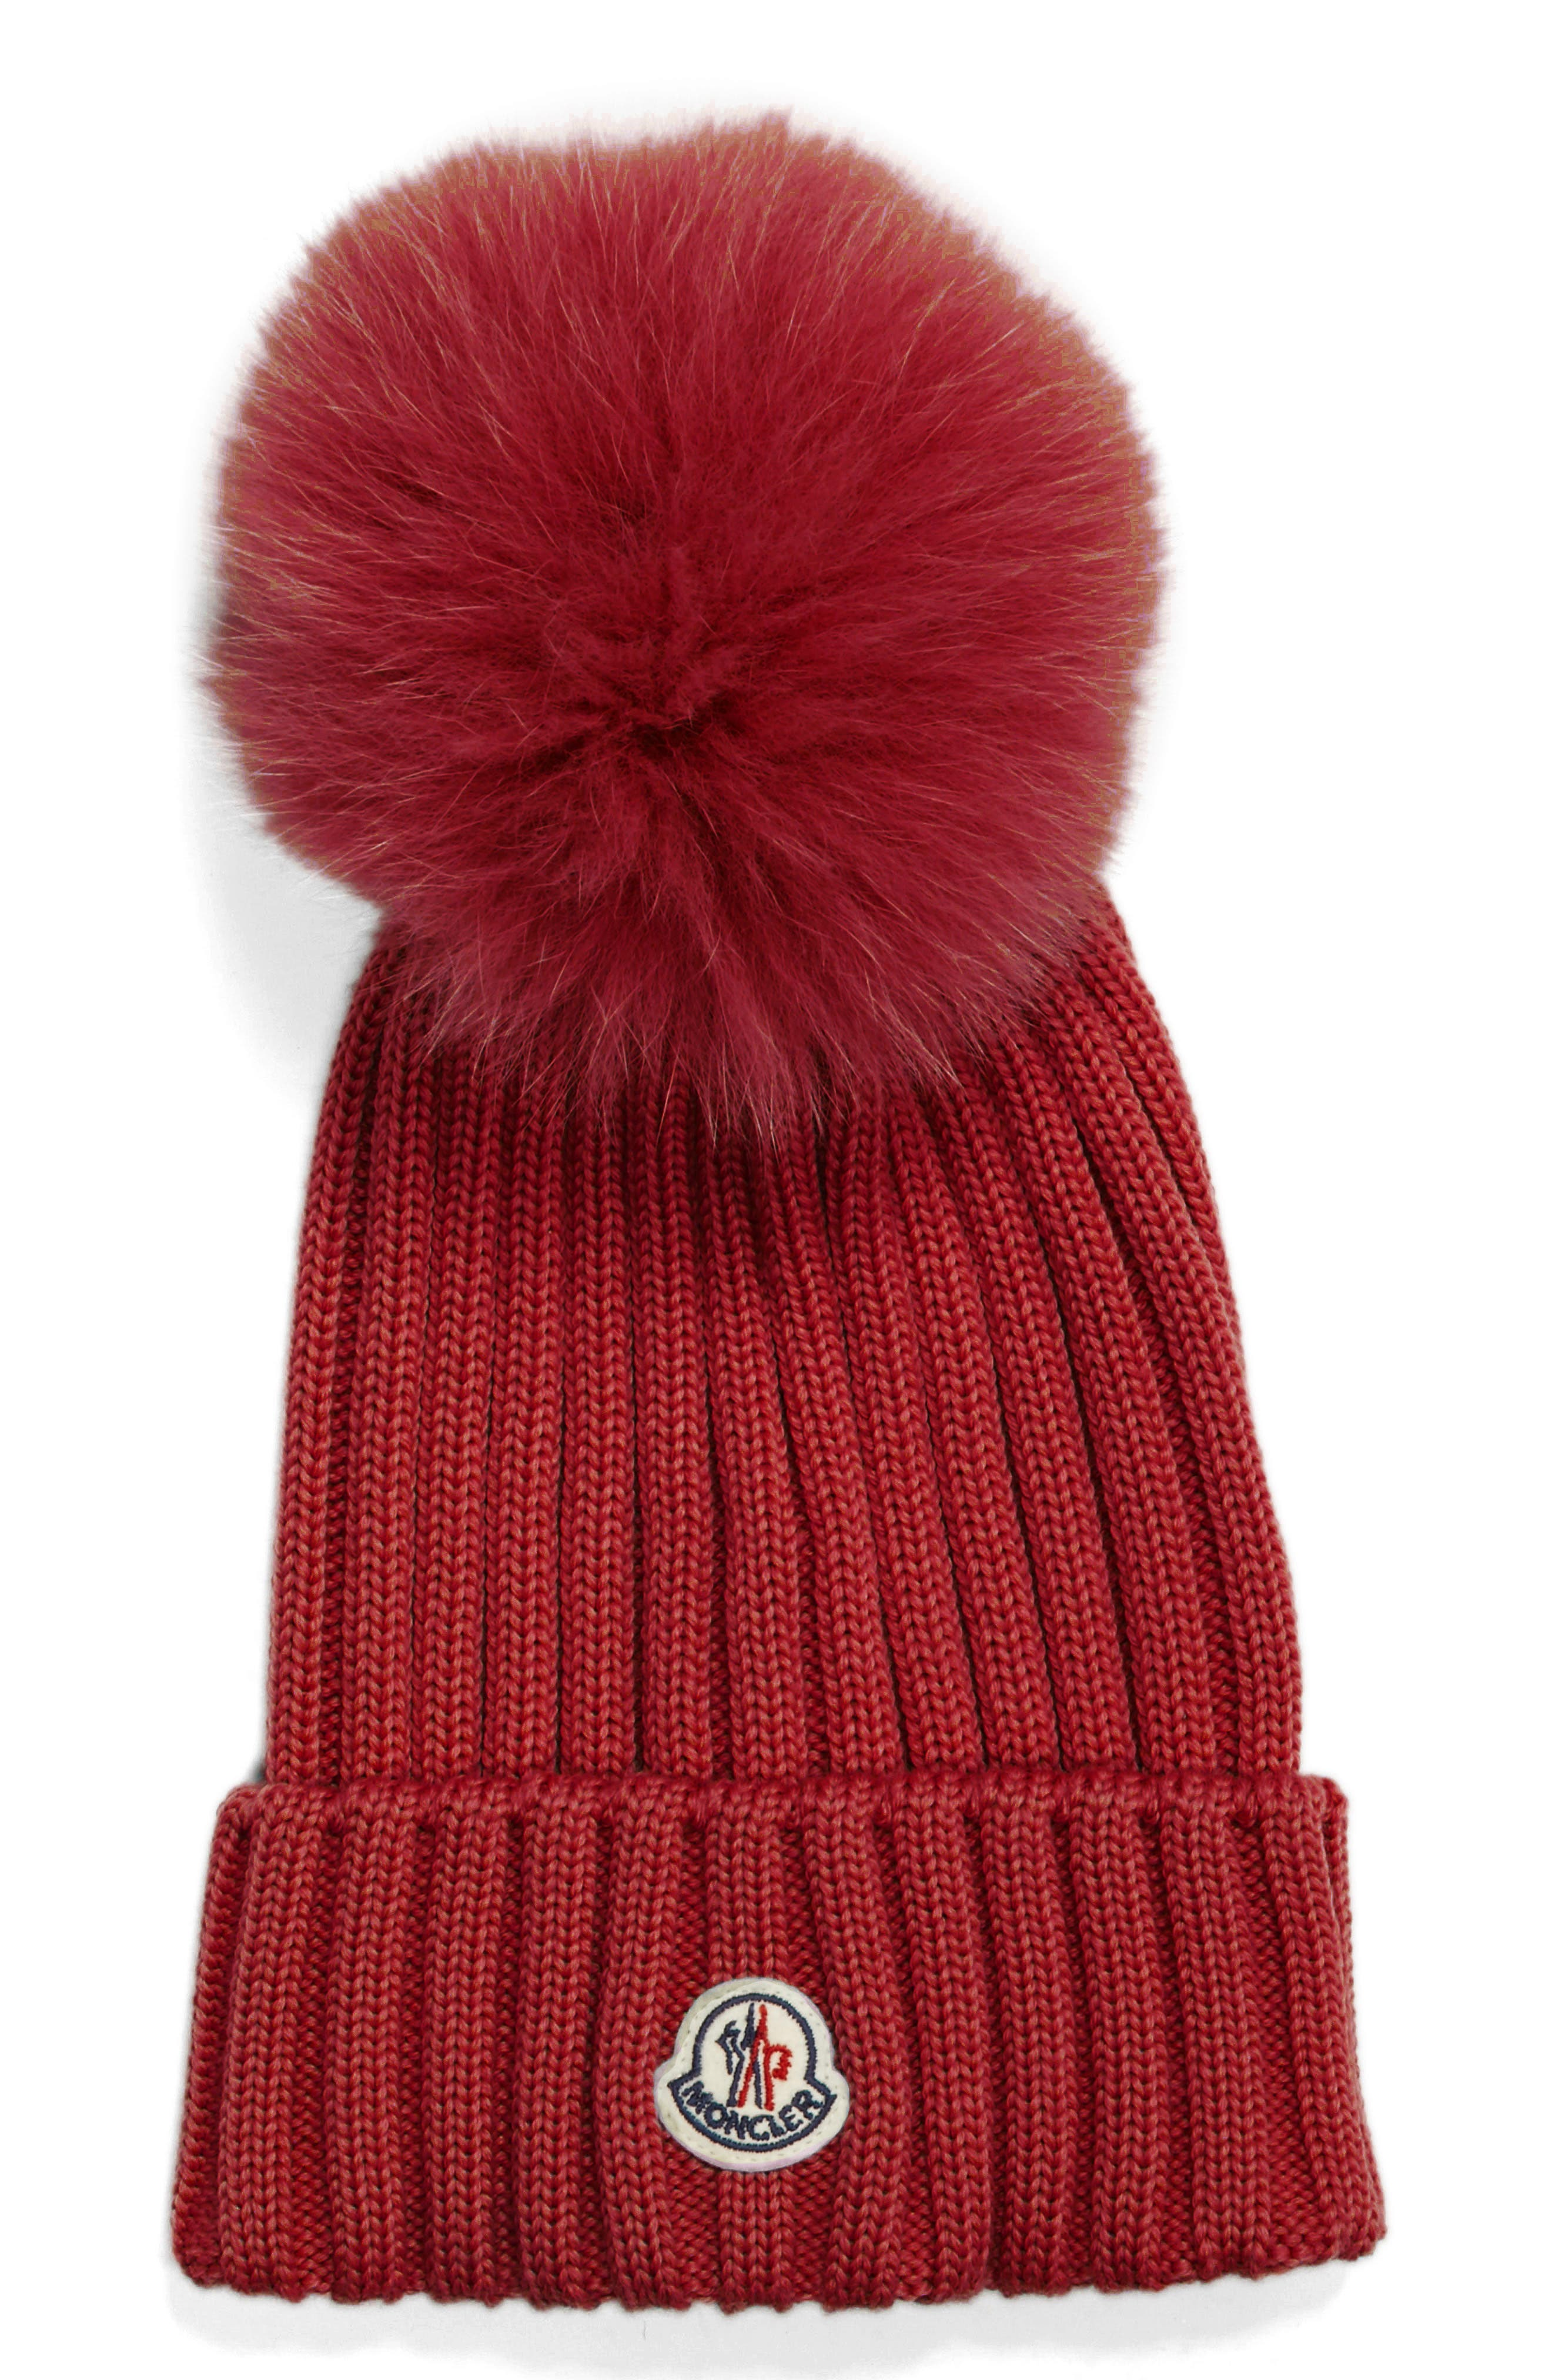 Moncler Genuine Fox Fur Pom Wool Beanie - Red